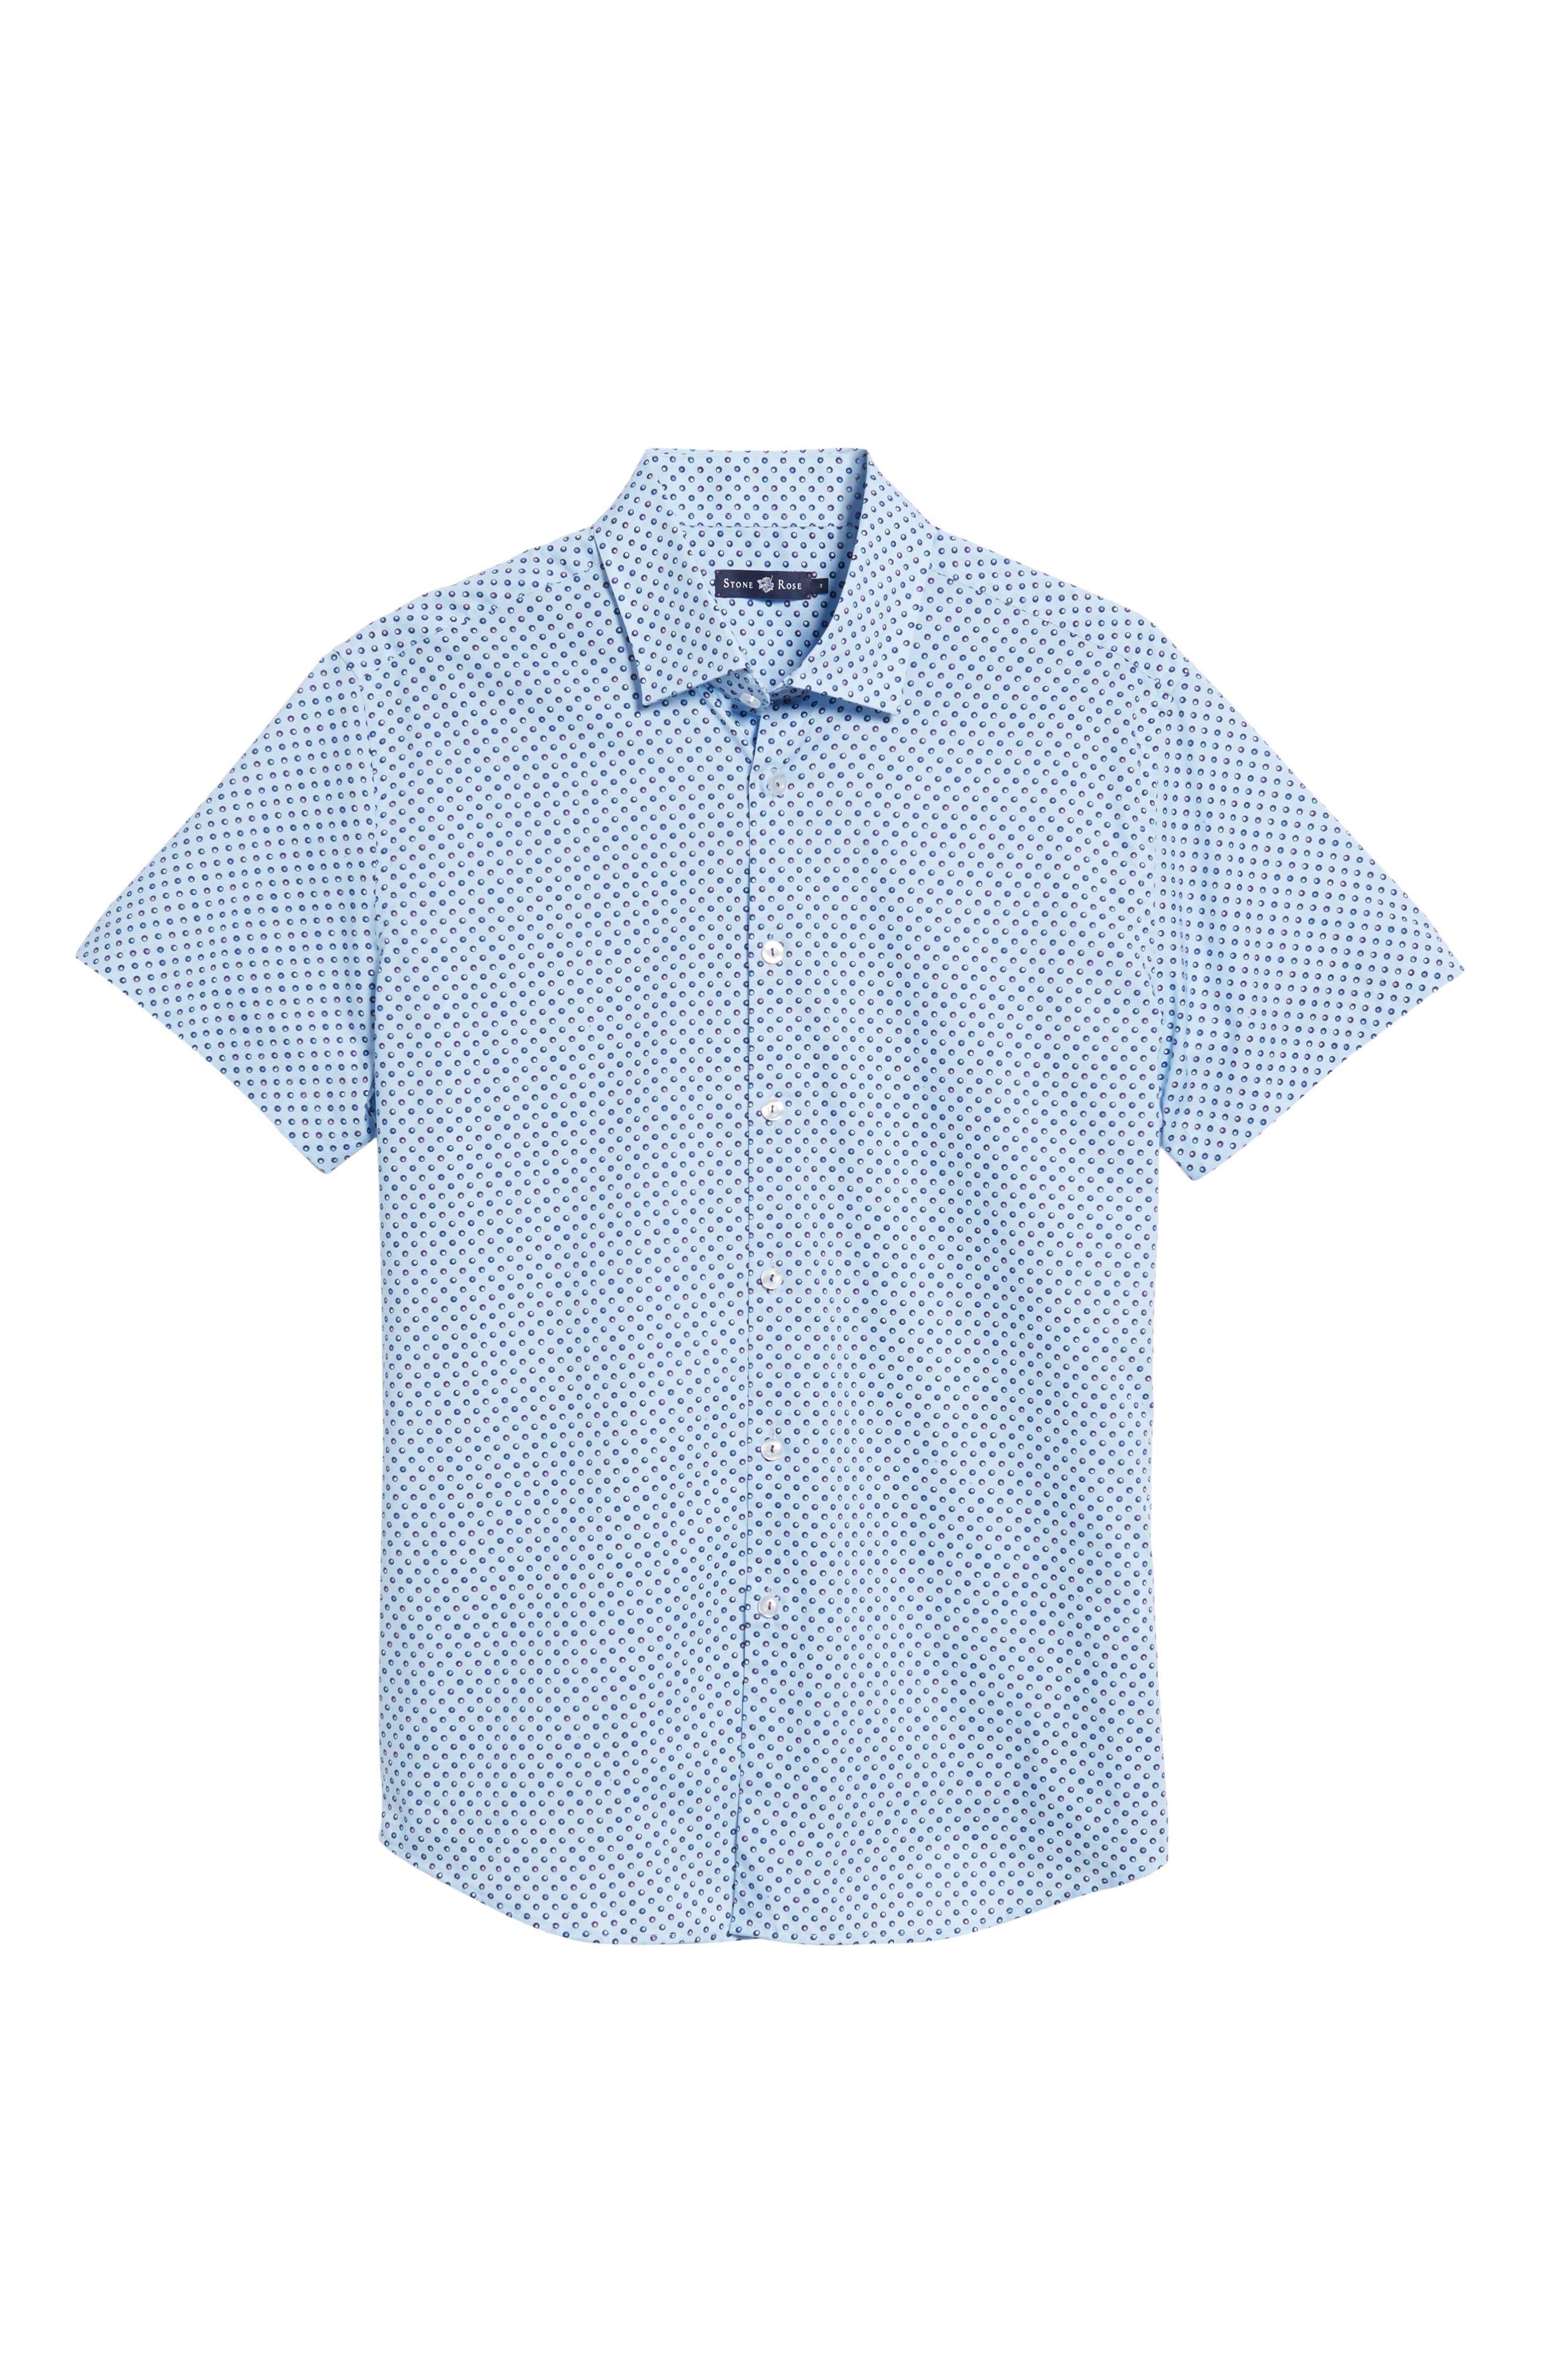 Trim Fit Circle Print Sport Shirt,                             Alternate thumbnail 6, color,                             450